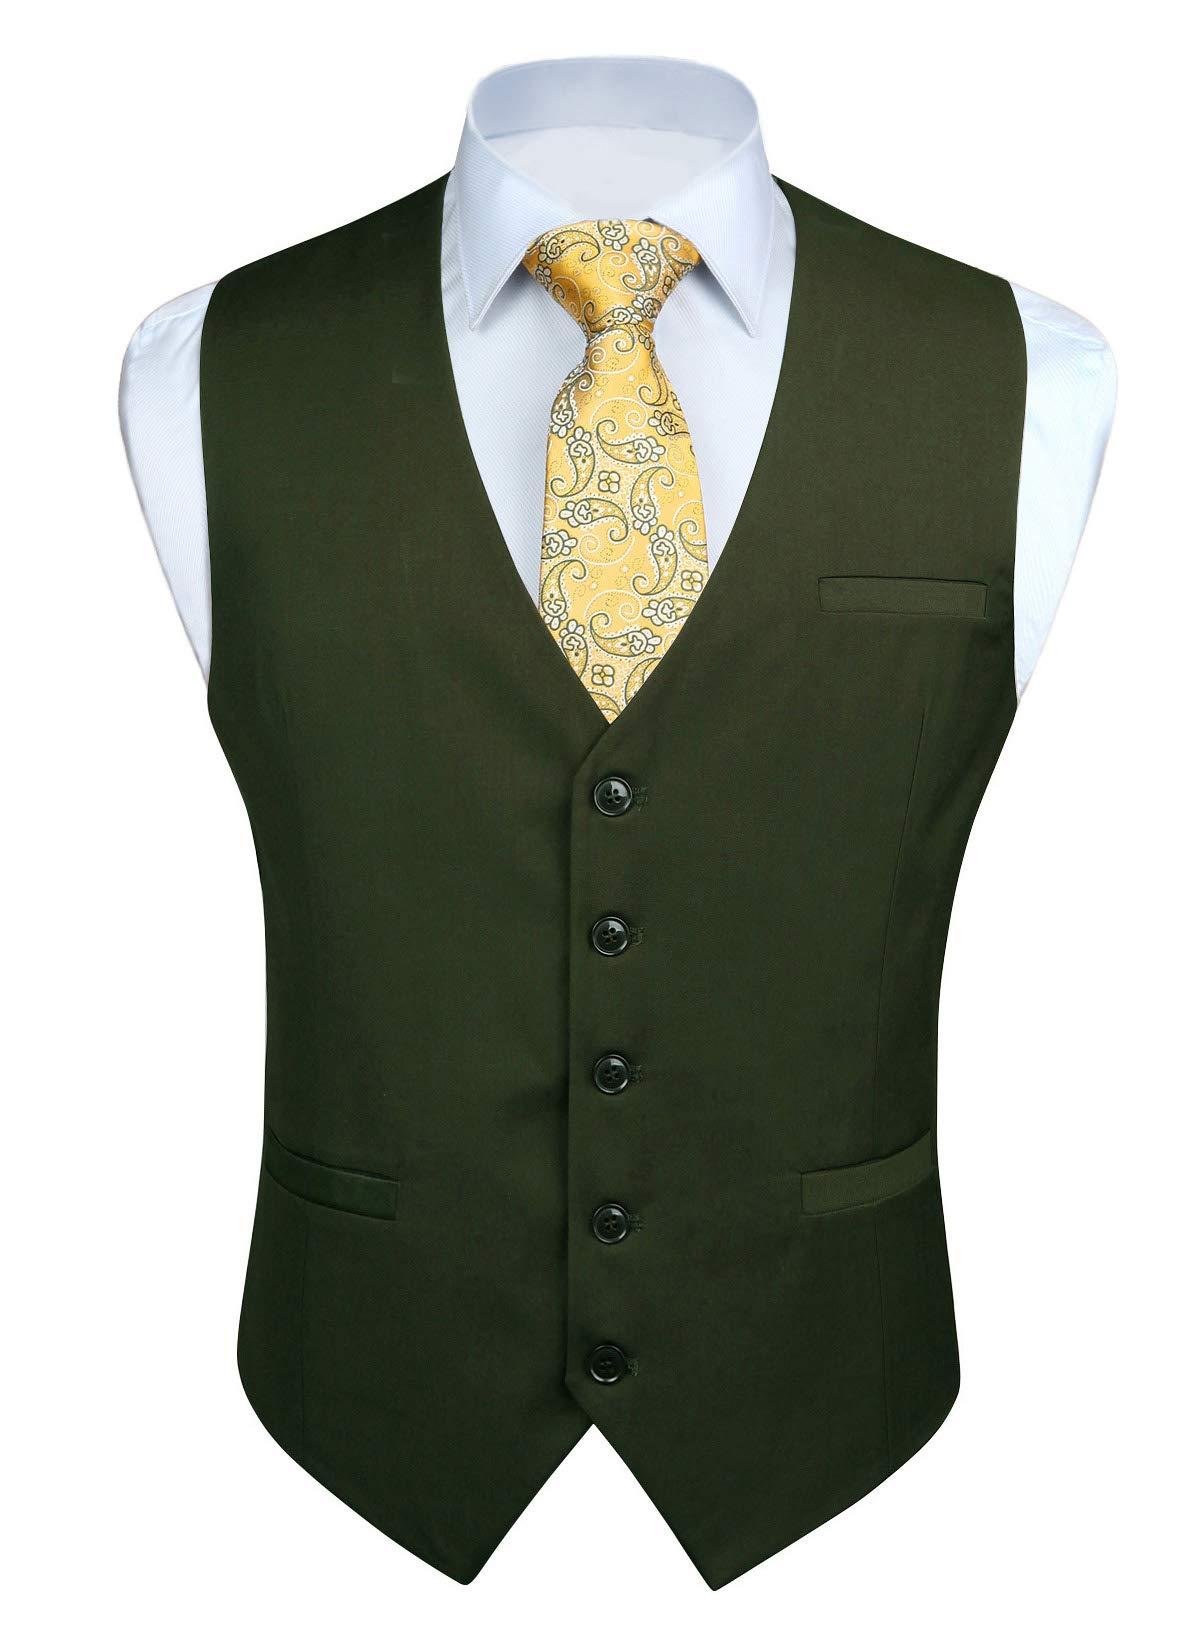 HISDERN Men's Suit Vest Business Formal Dress Waistcoat Vest with 3 Pockets for Suit or Tuxedo Green by HISDERN